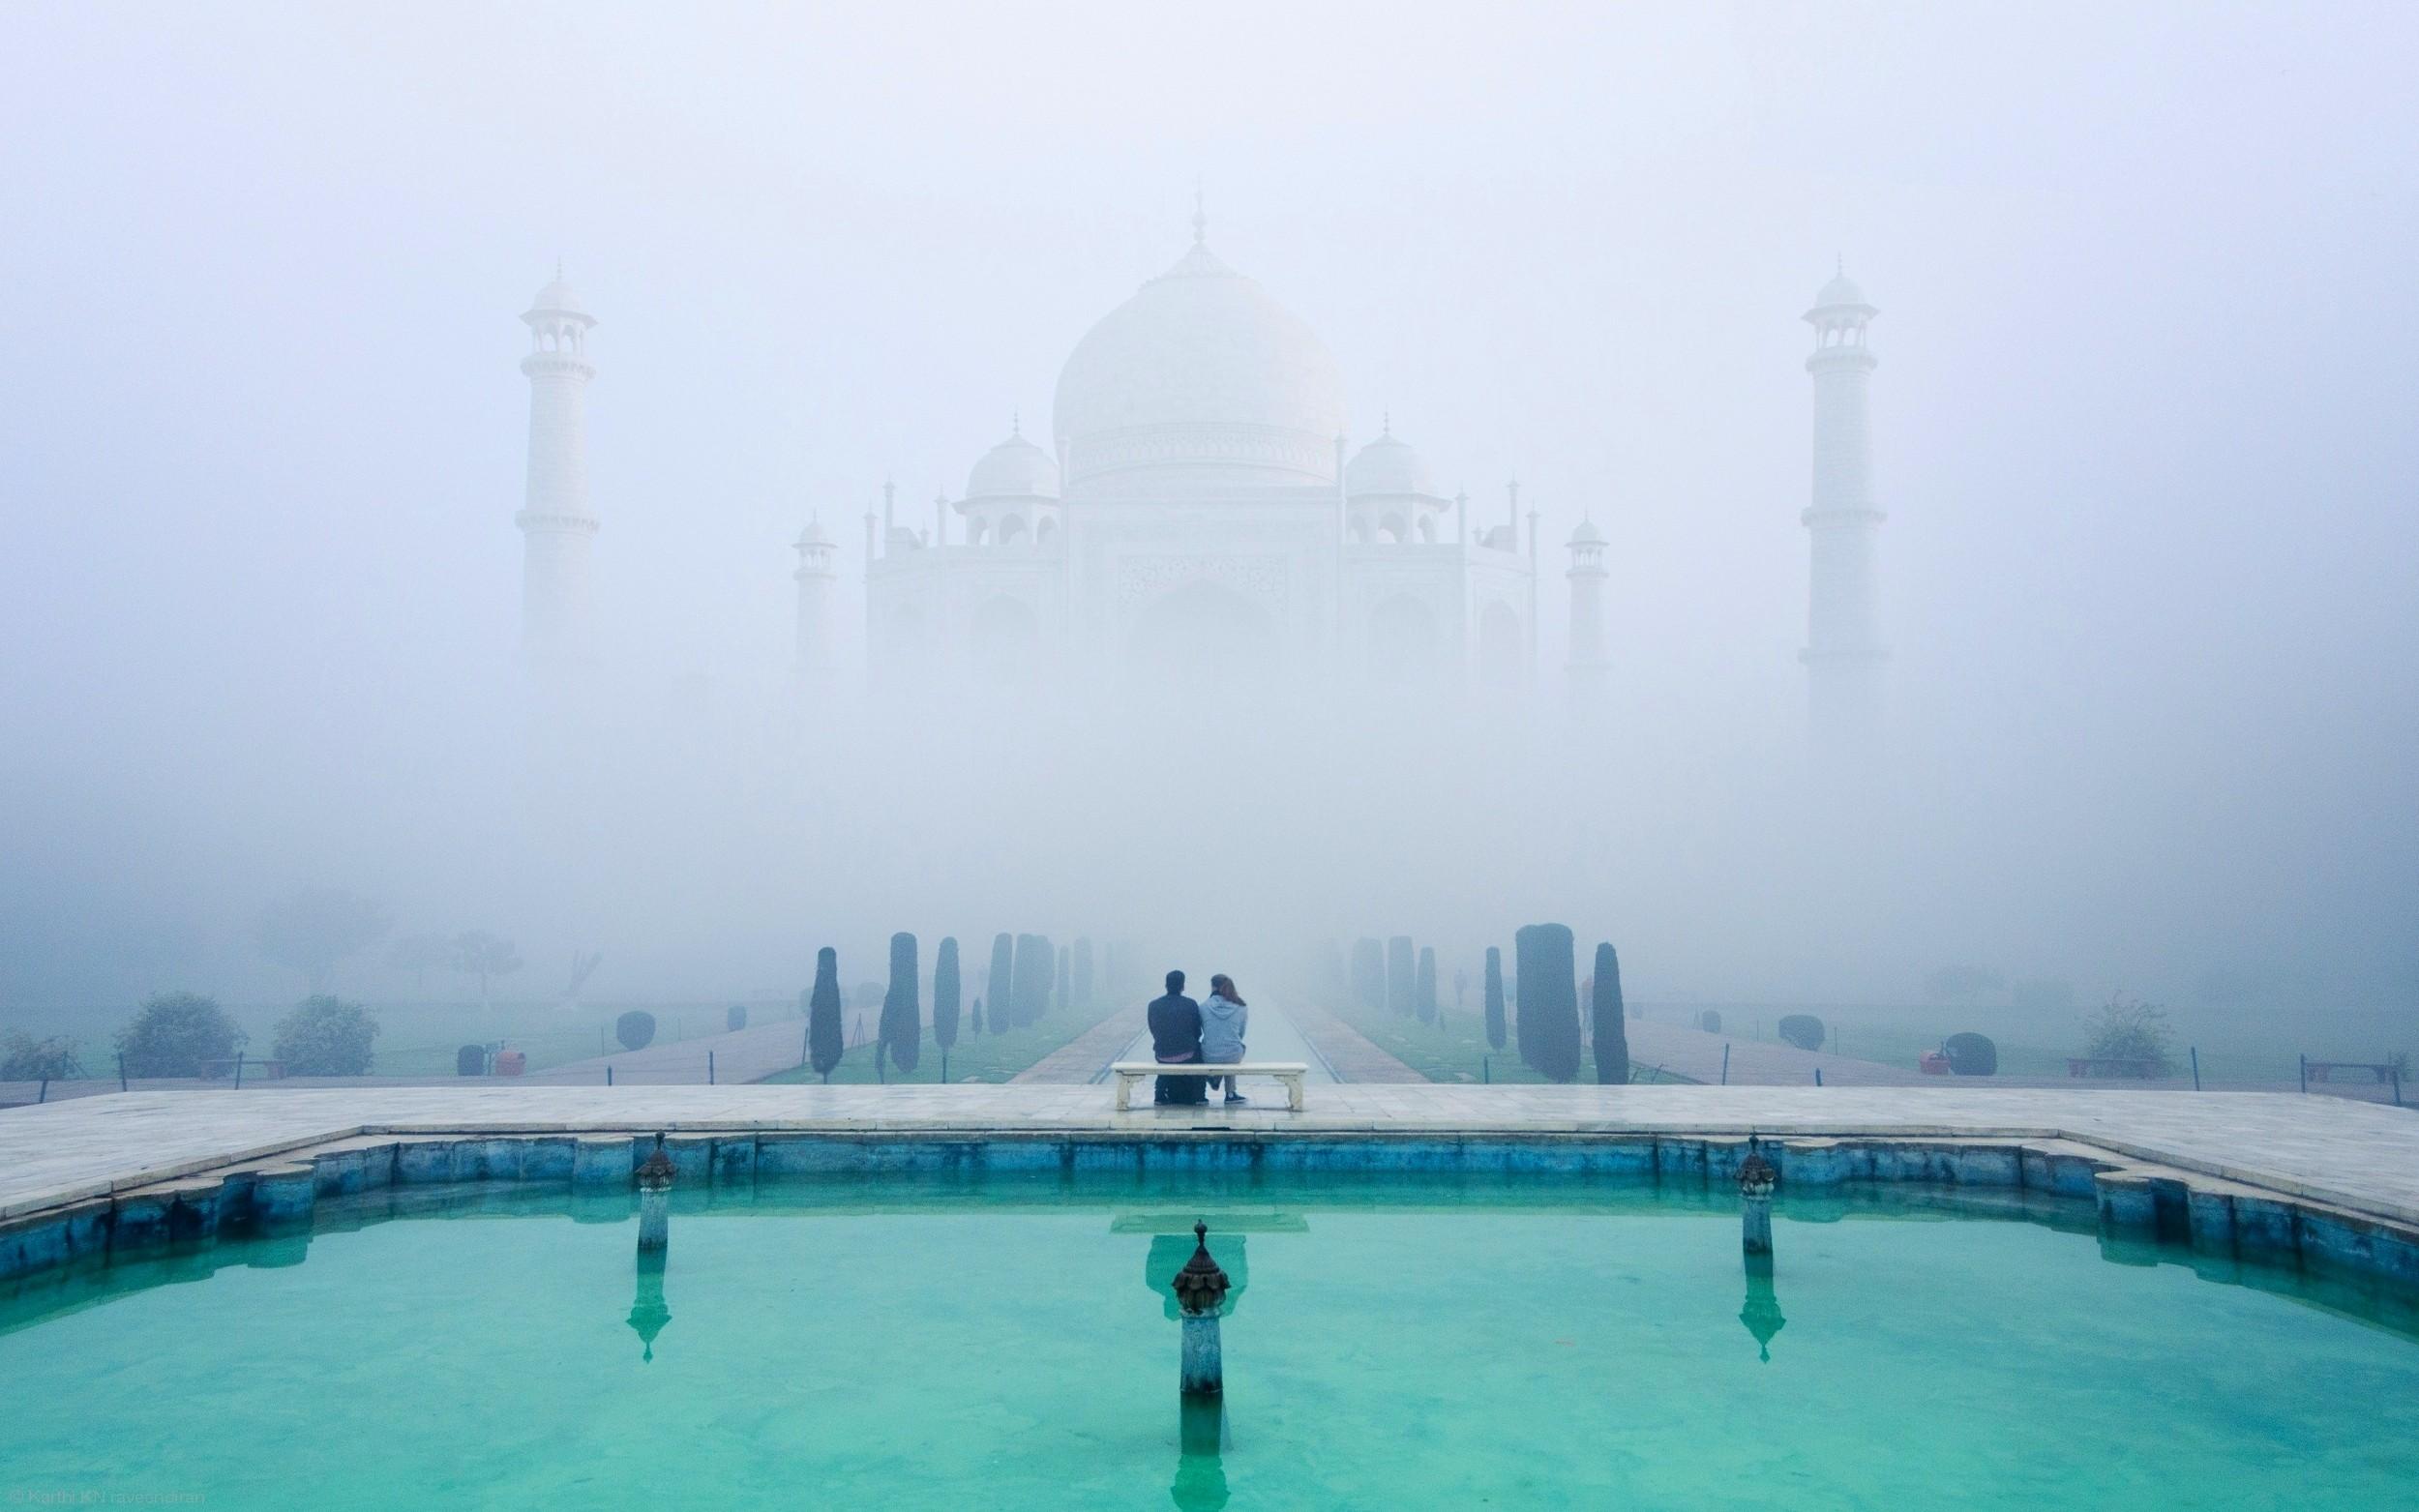 Taj Mahal in the Fog